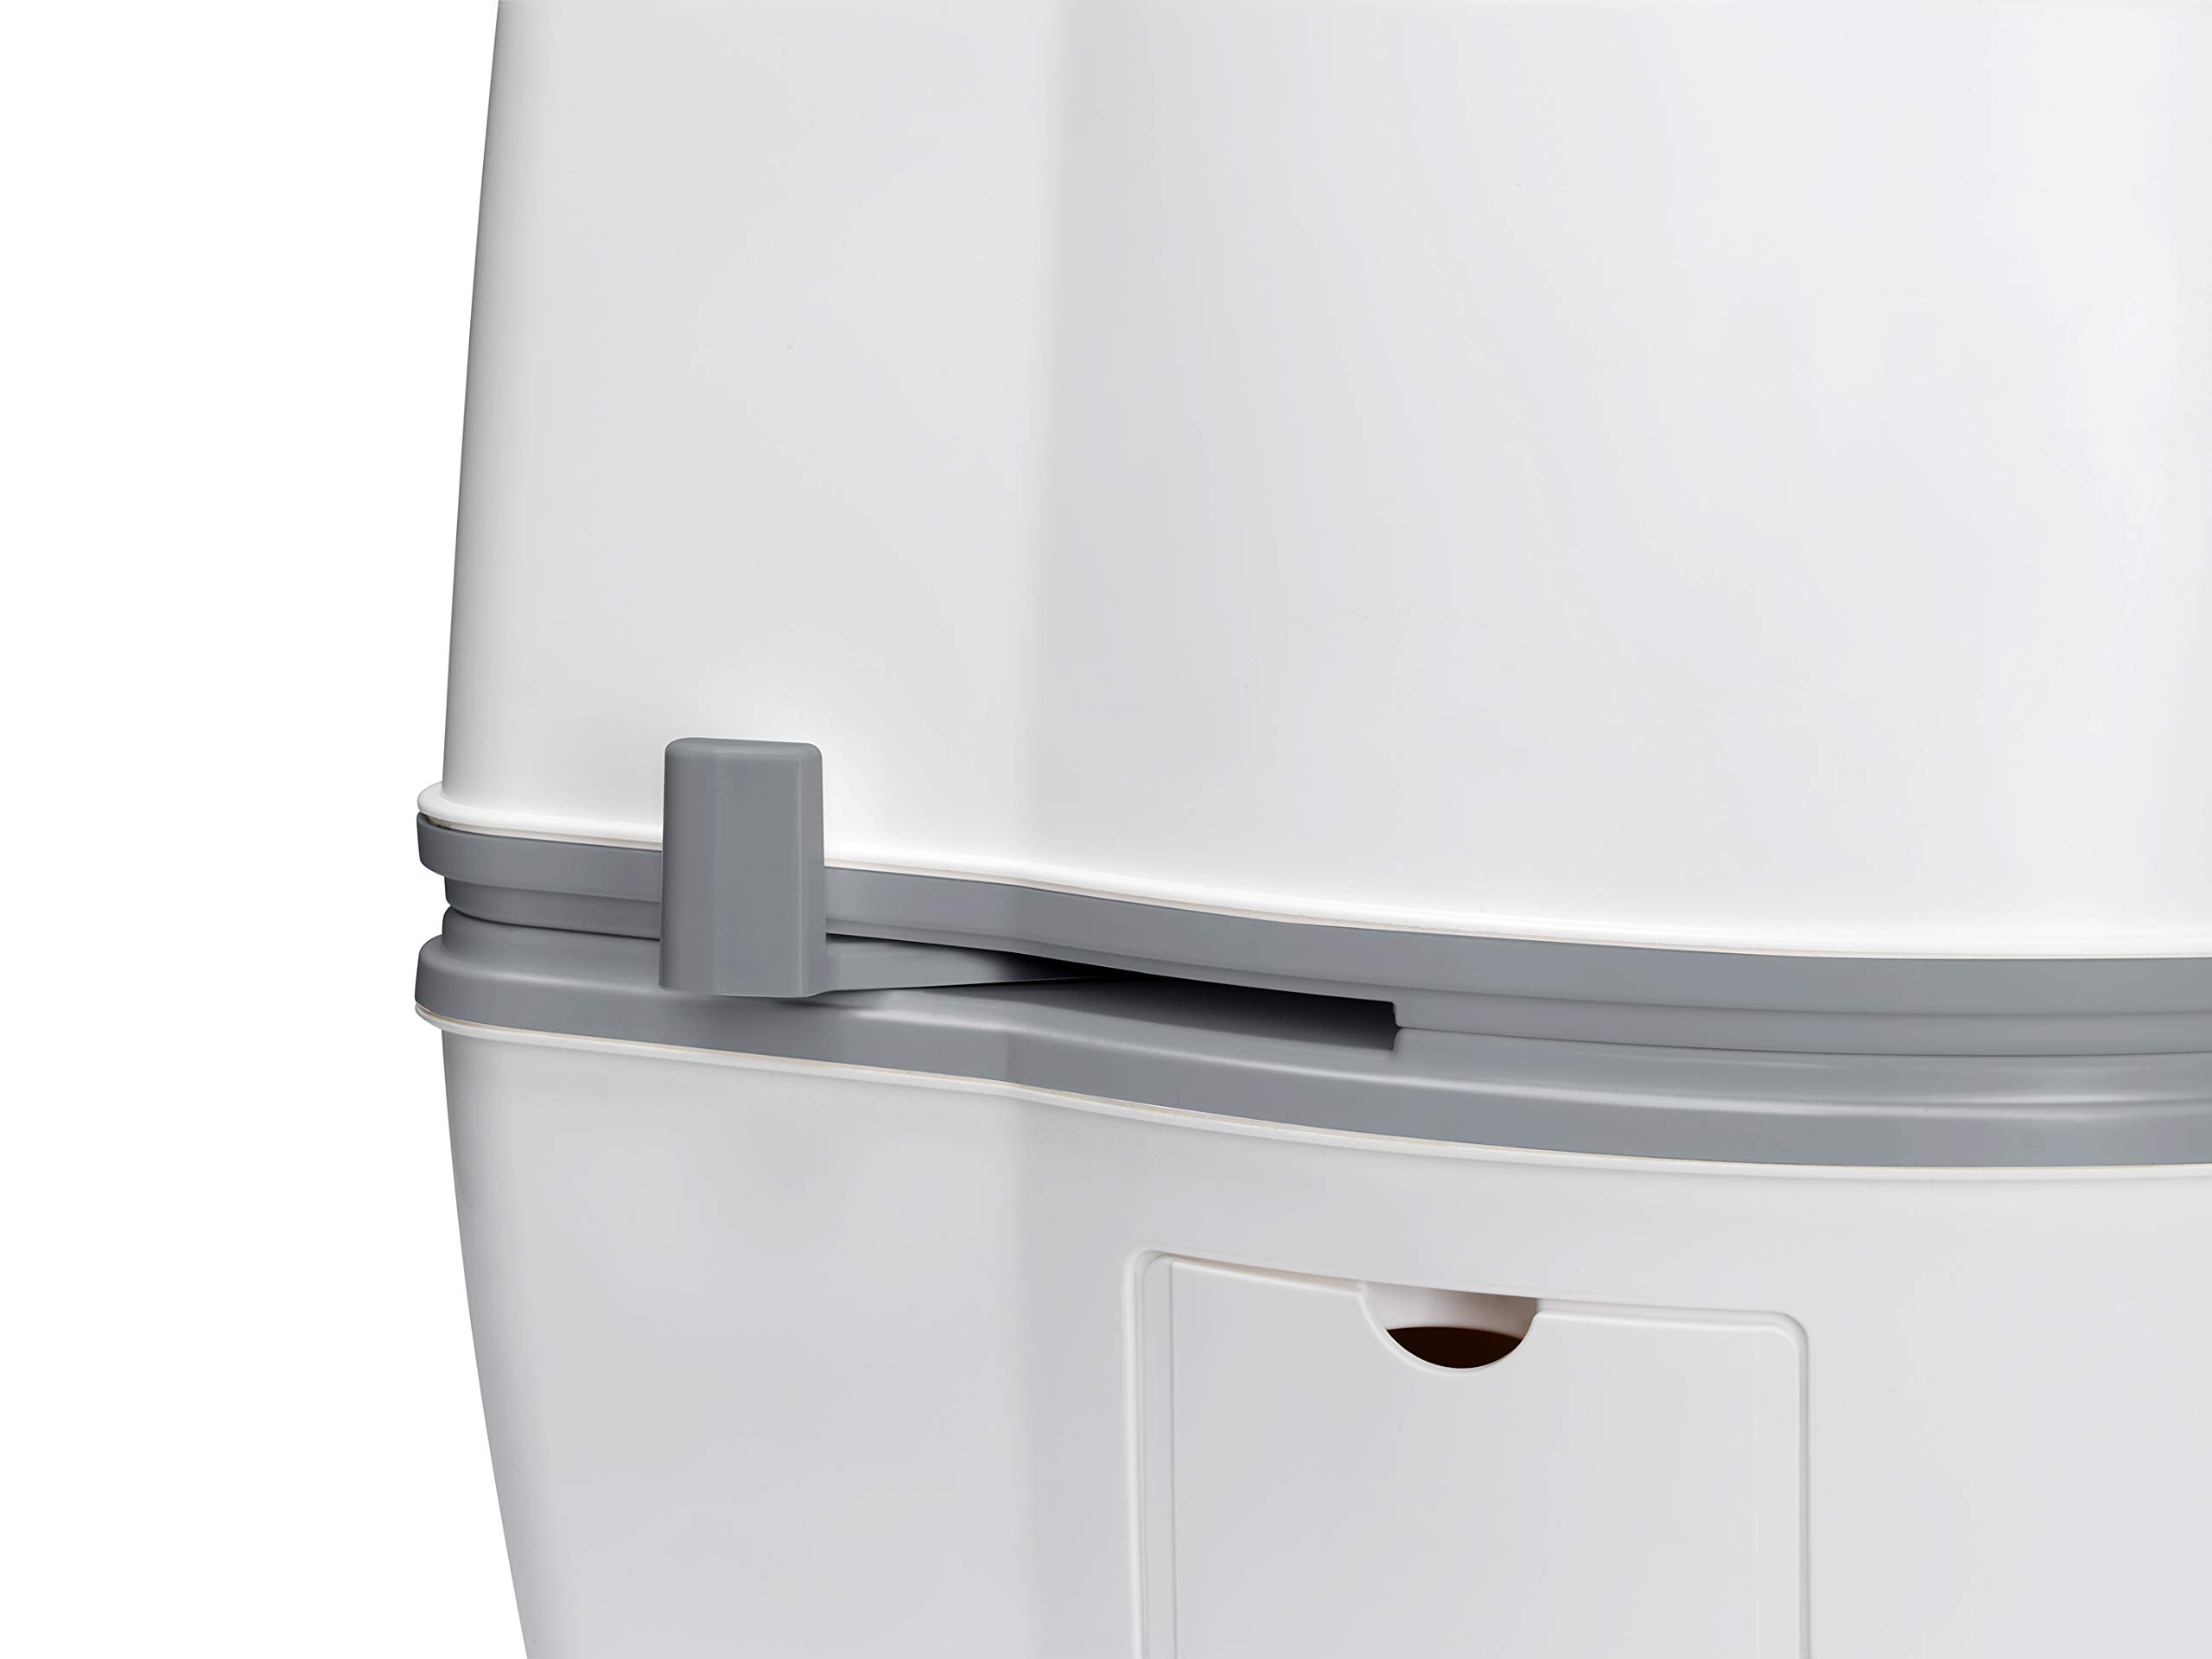 Thetford 92305 Porta Potti 565P Excellence Portable Toilet (Manual), 448 x 388 x 450 mm 9